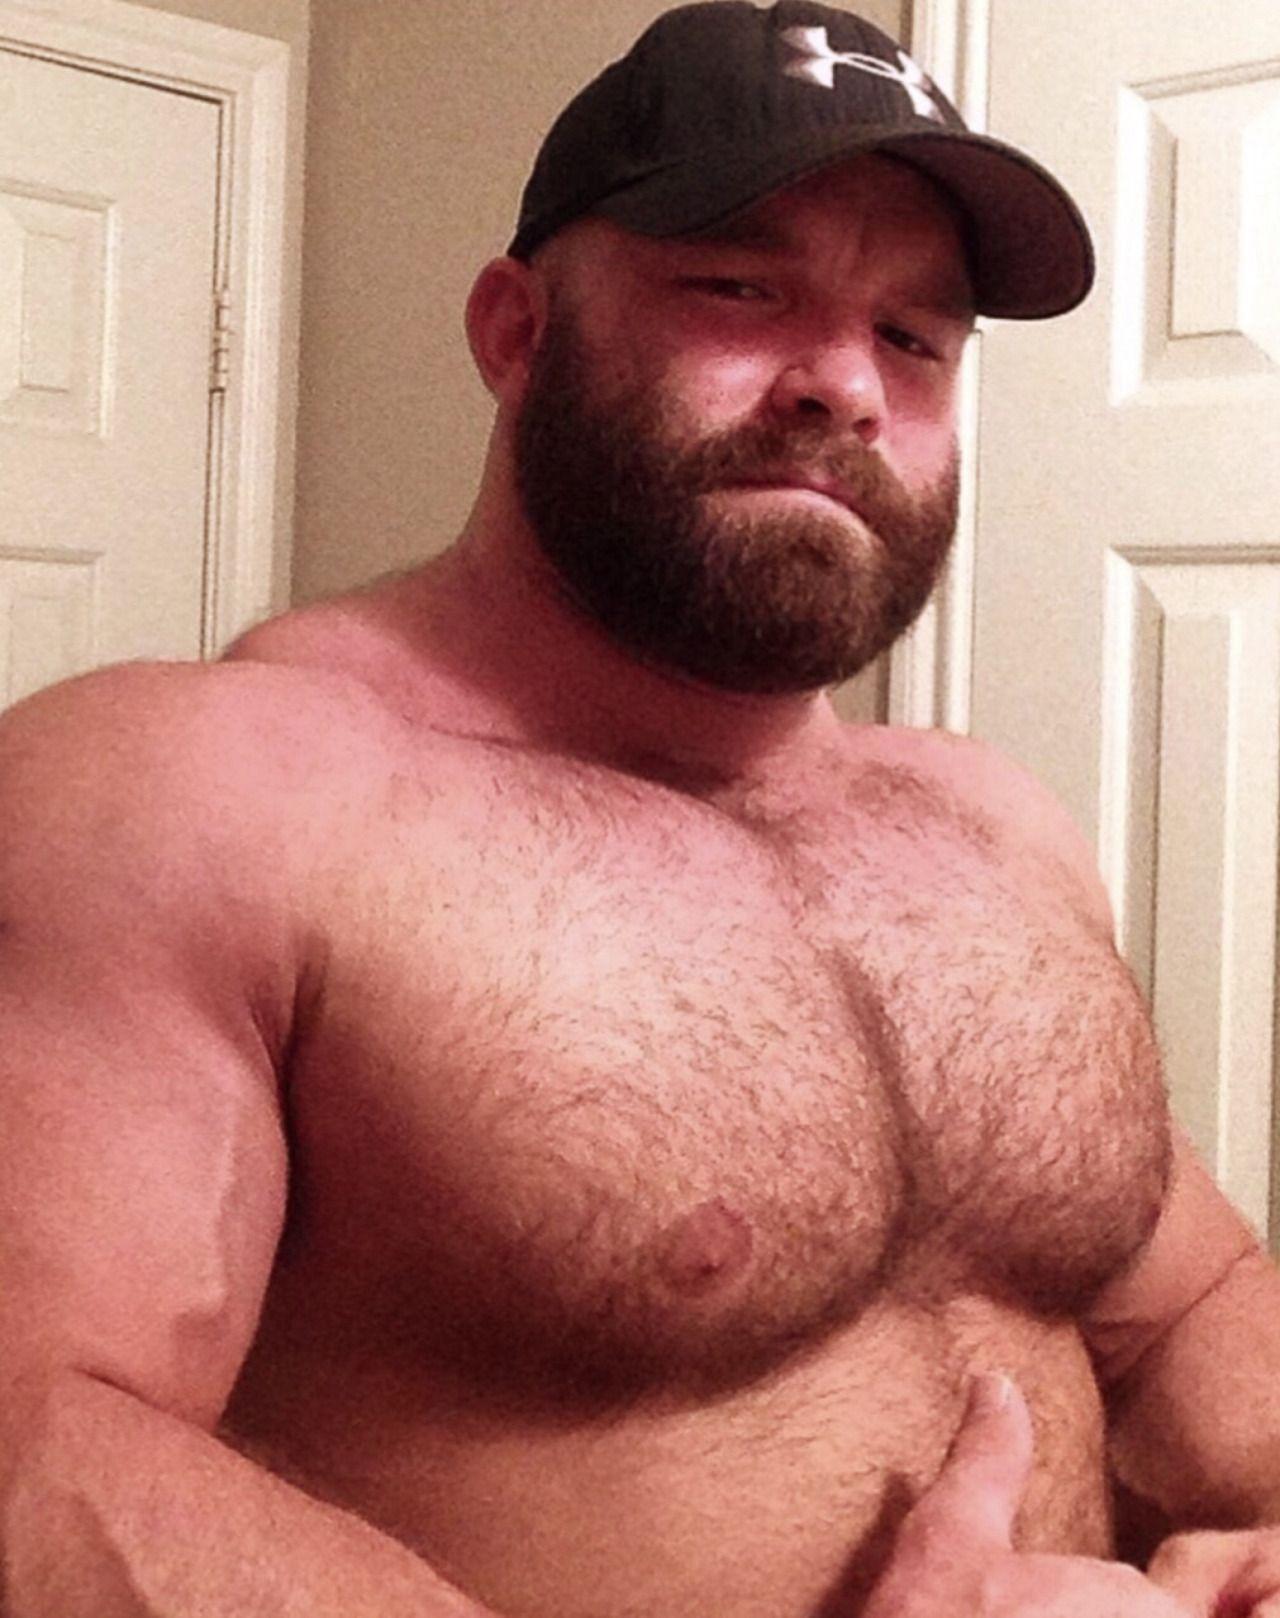 Bear fetish and hairy